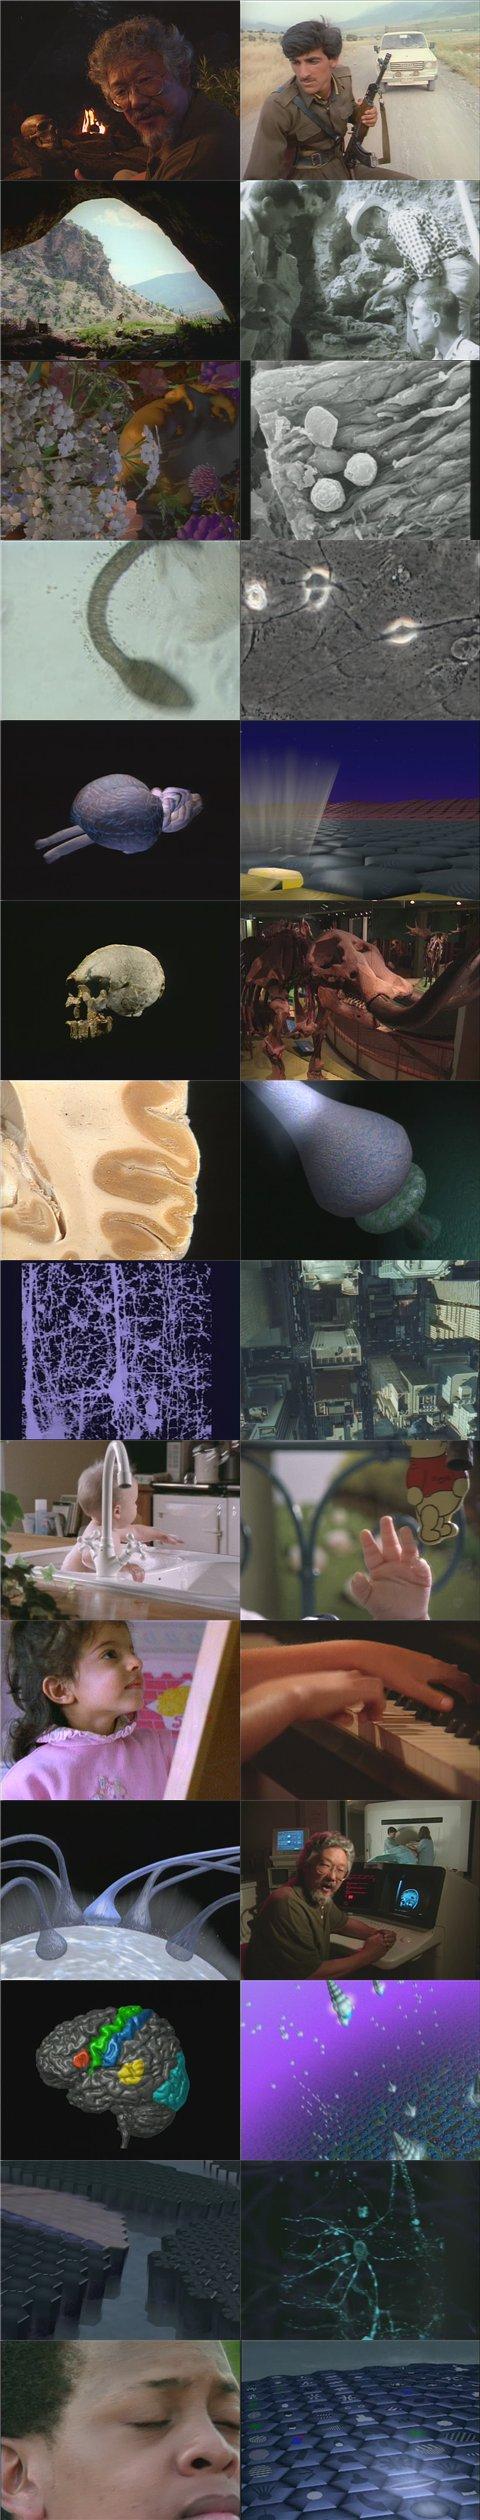 DSC The Brain: Our Universe Within   Evolution DivX AC3 dual audio ( preview 1